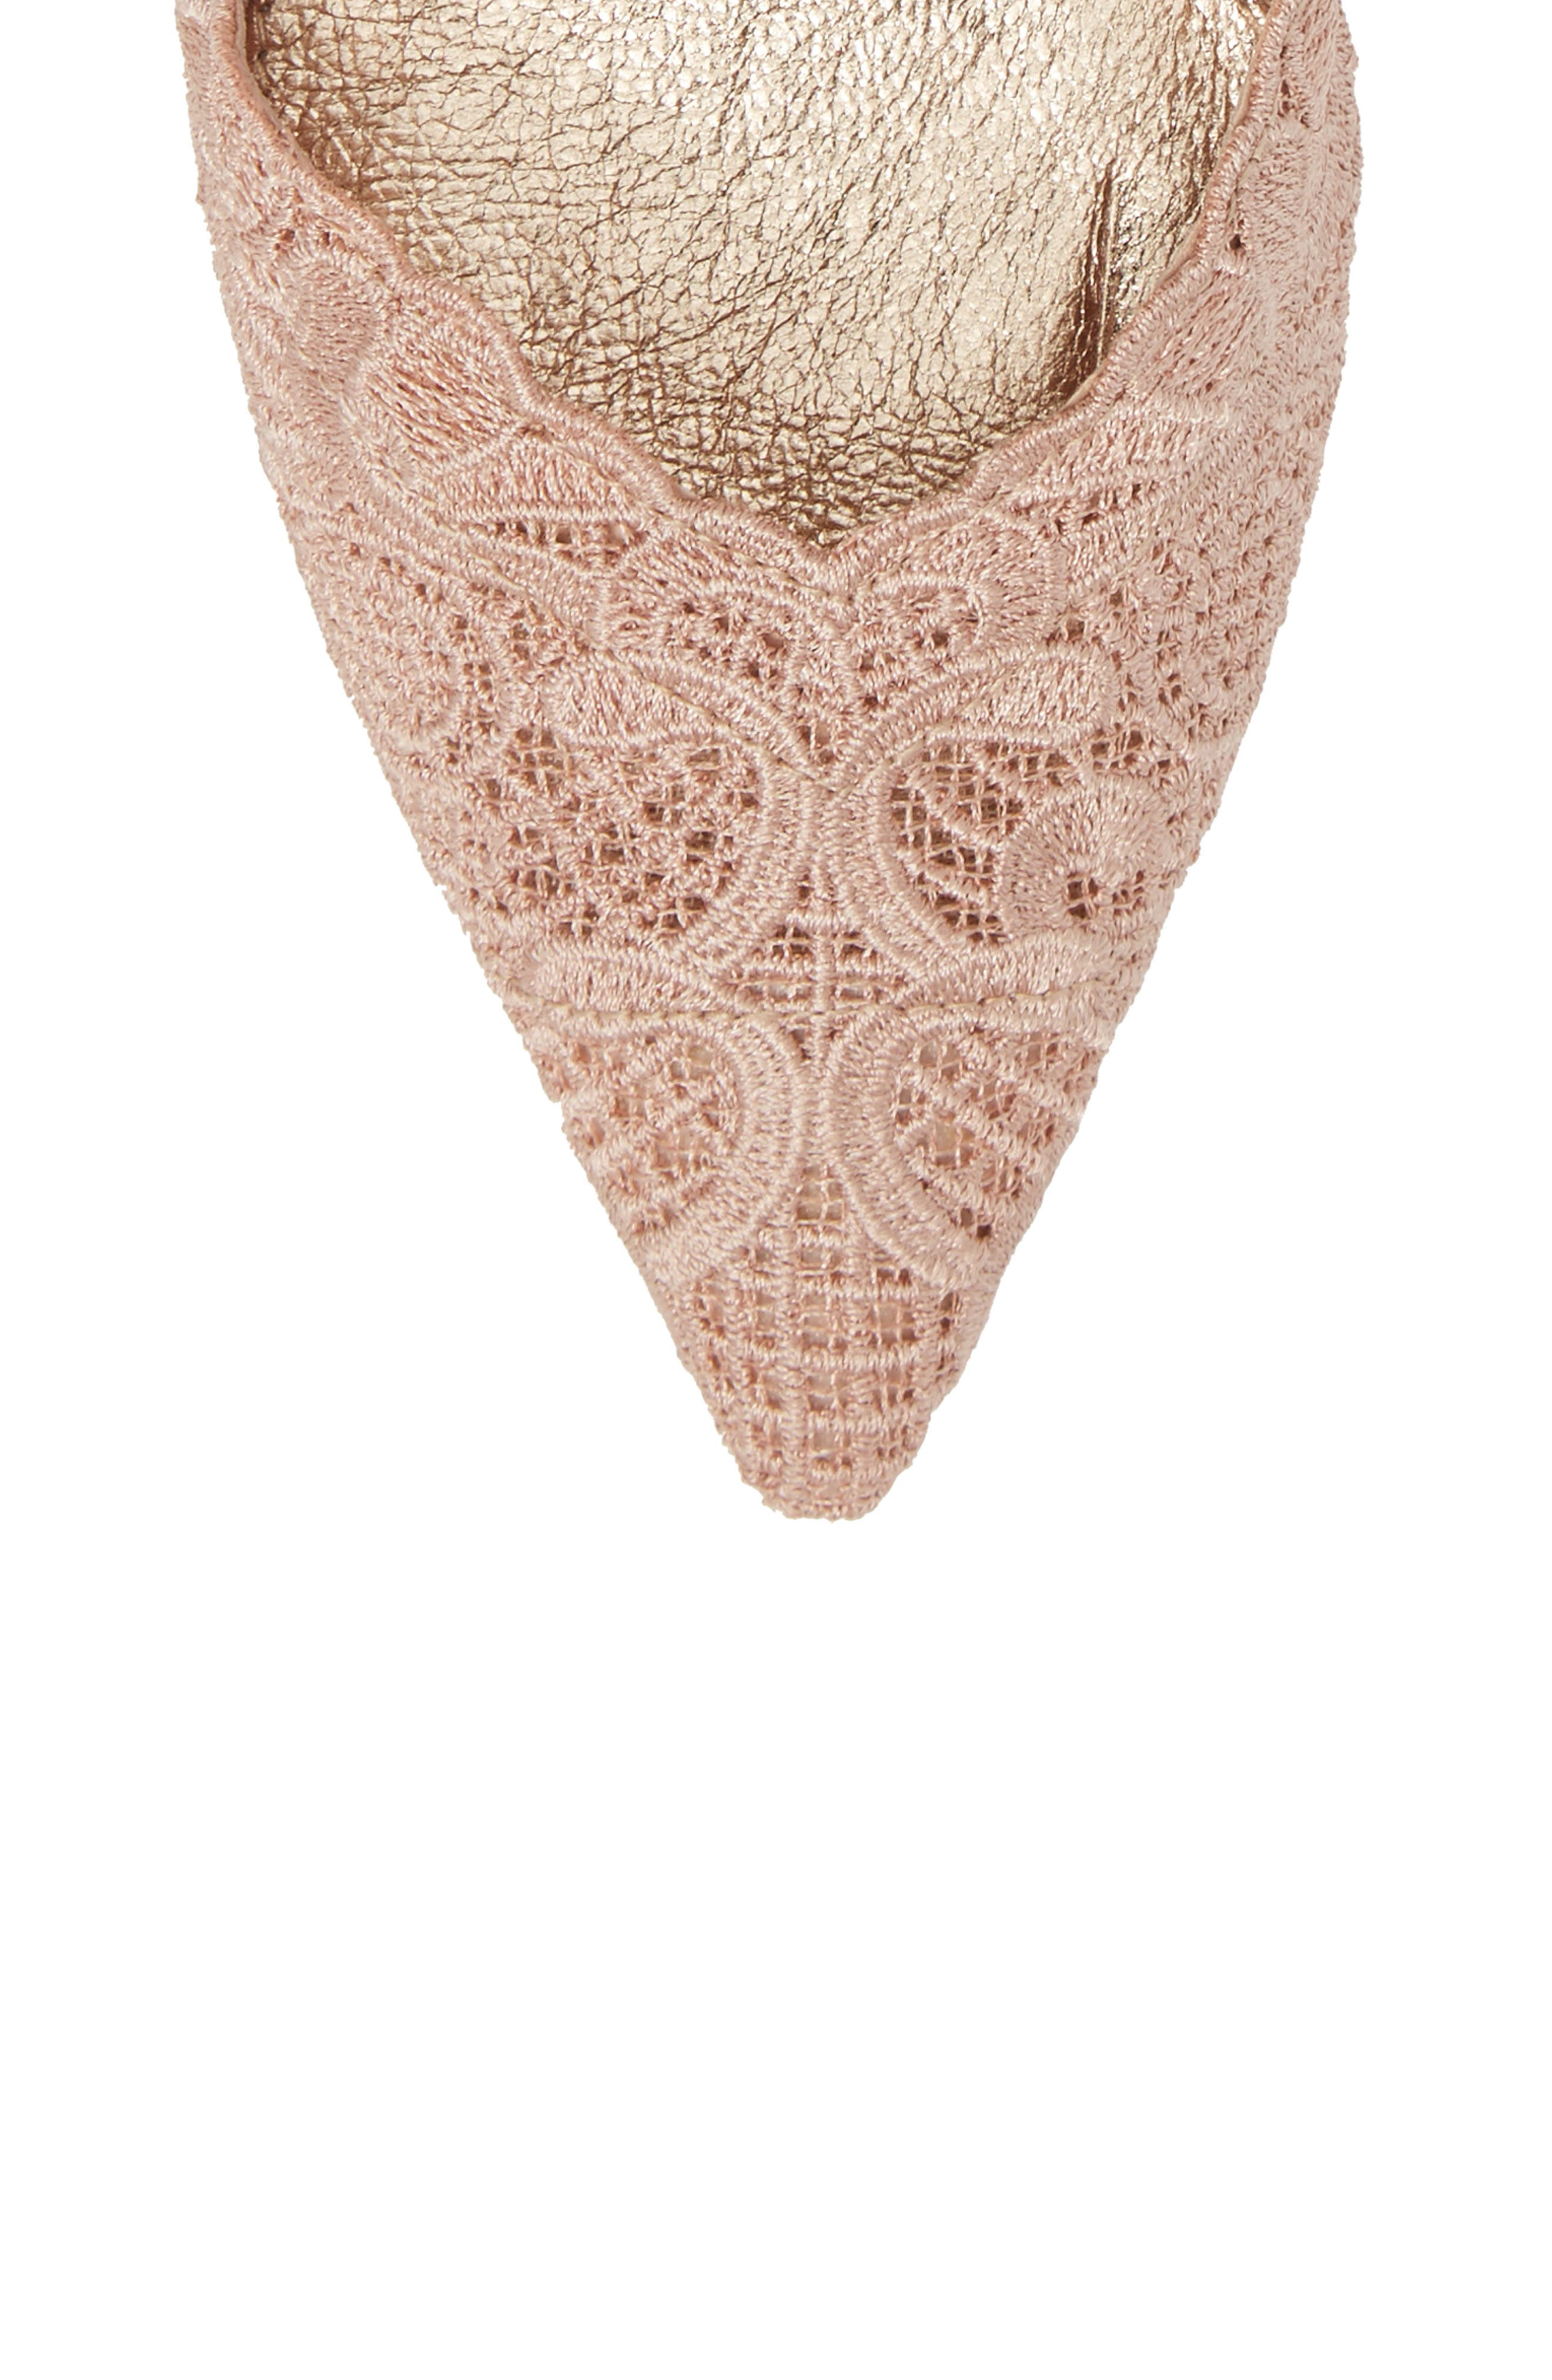 Hallie Slingback Pump,                             Alternate thumbnail 5, color,                             Blush Attalie Lace Fabric